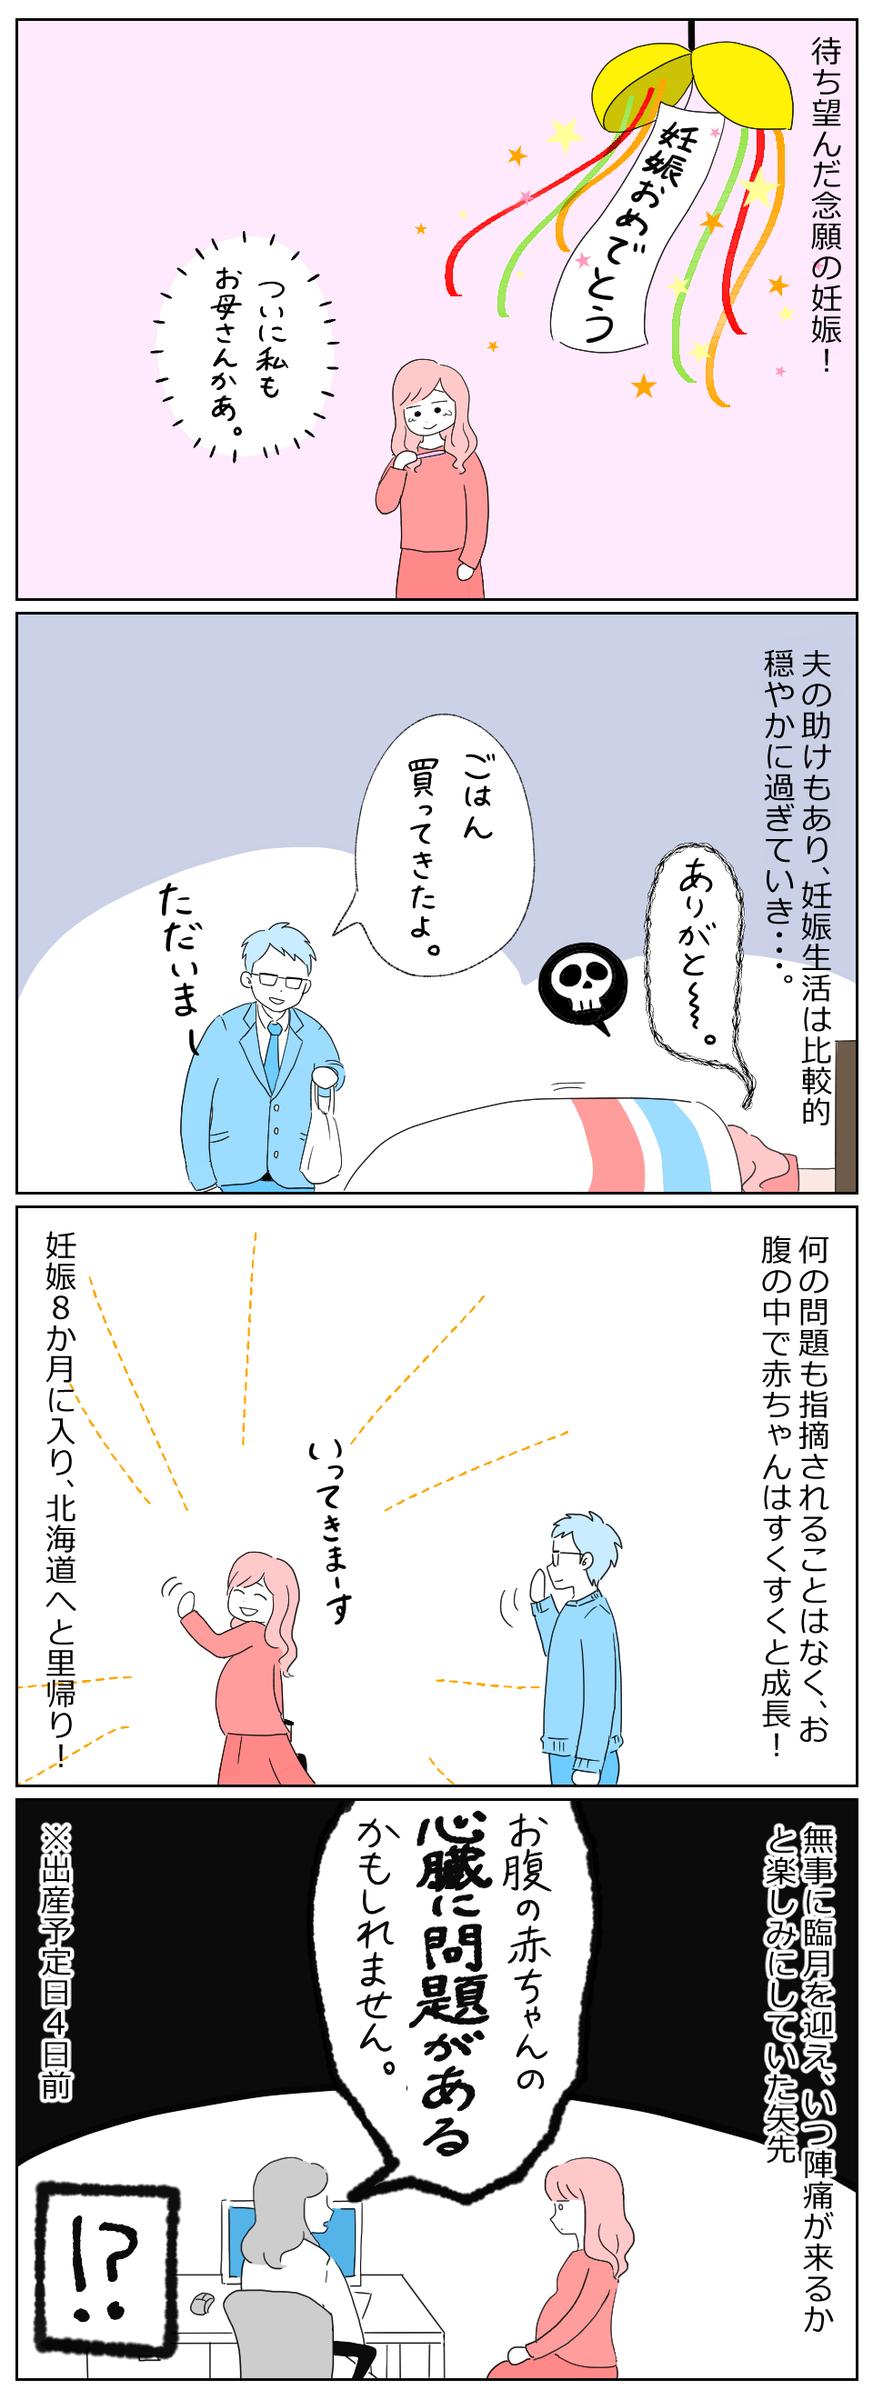 f:id:kayarimo:20190315214923j:plain